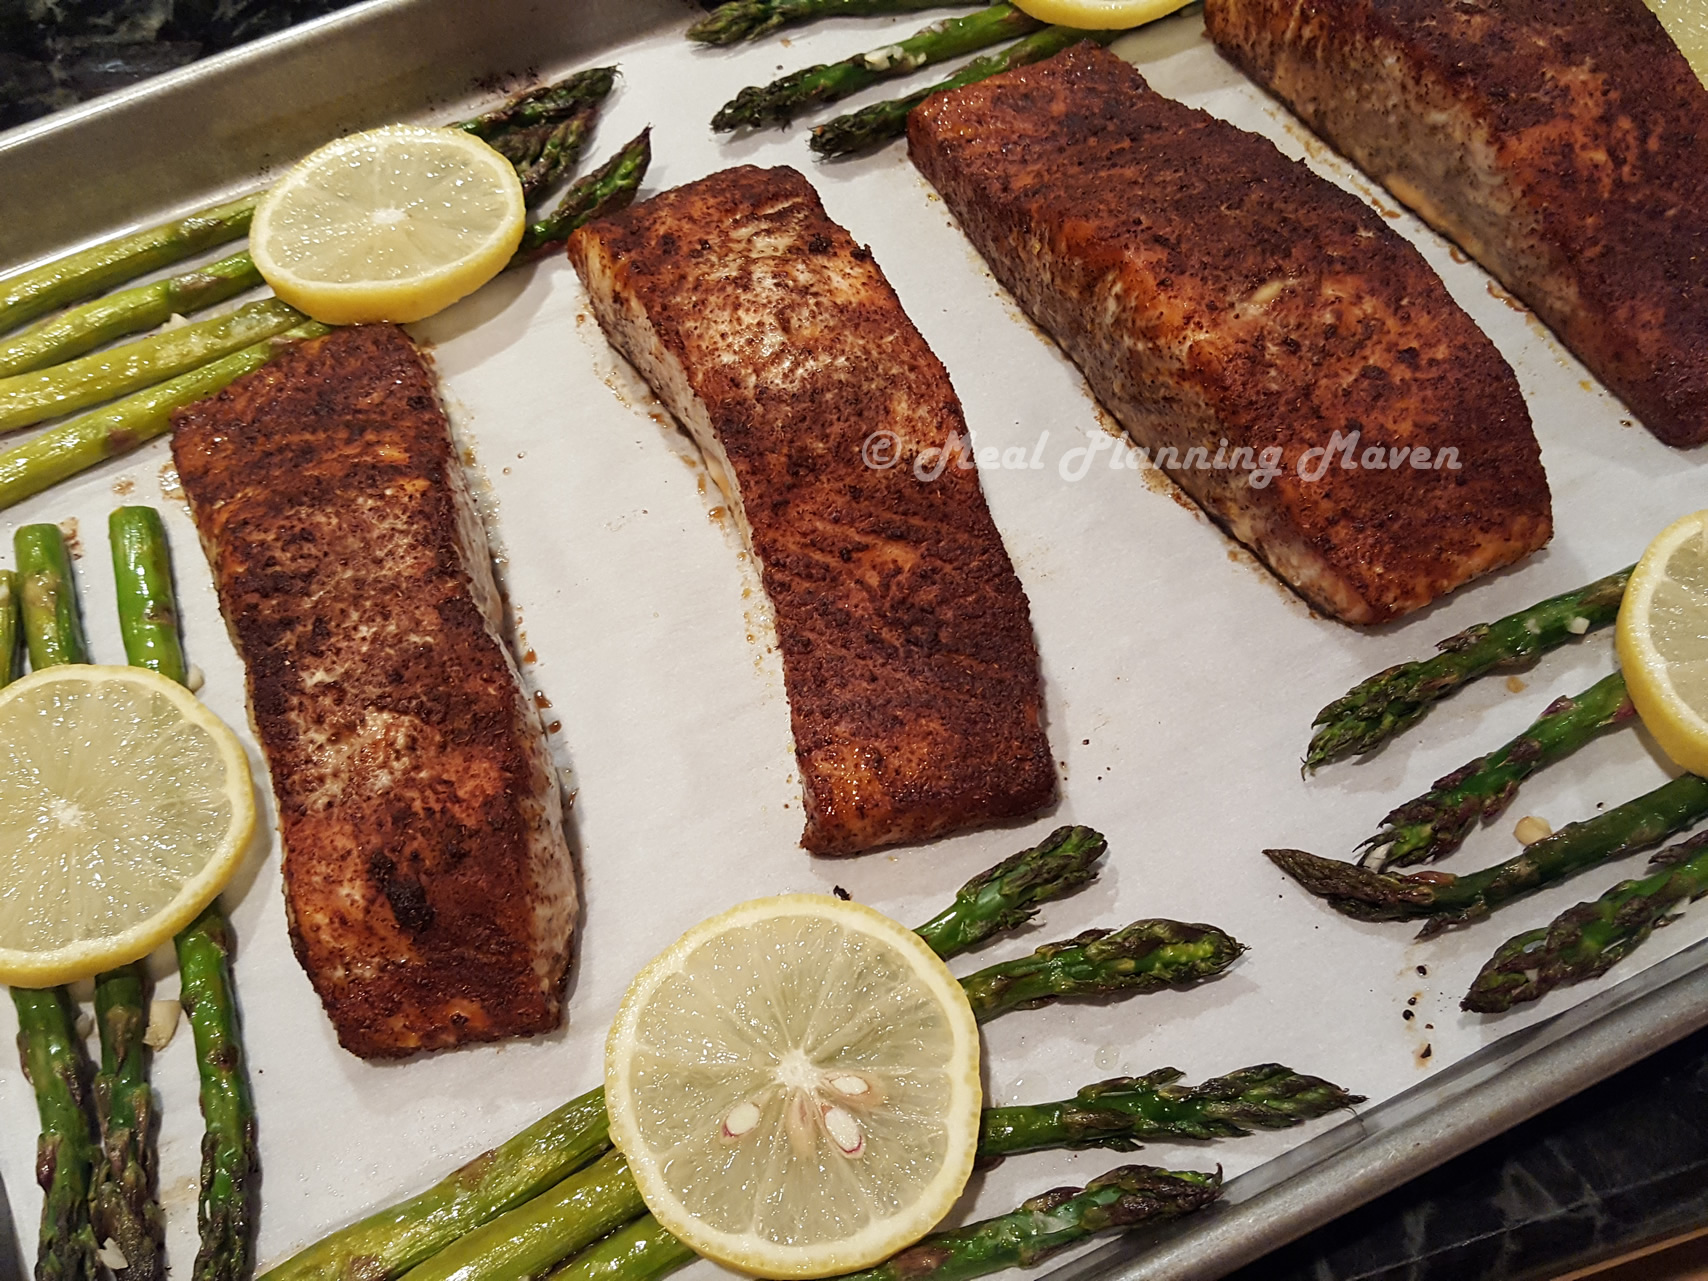 Sheet Pan Bronzed Salmon 'n Asparagus